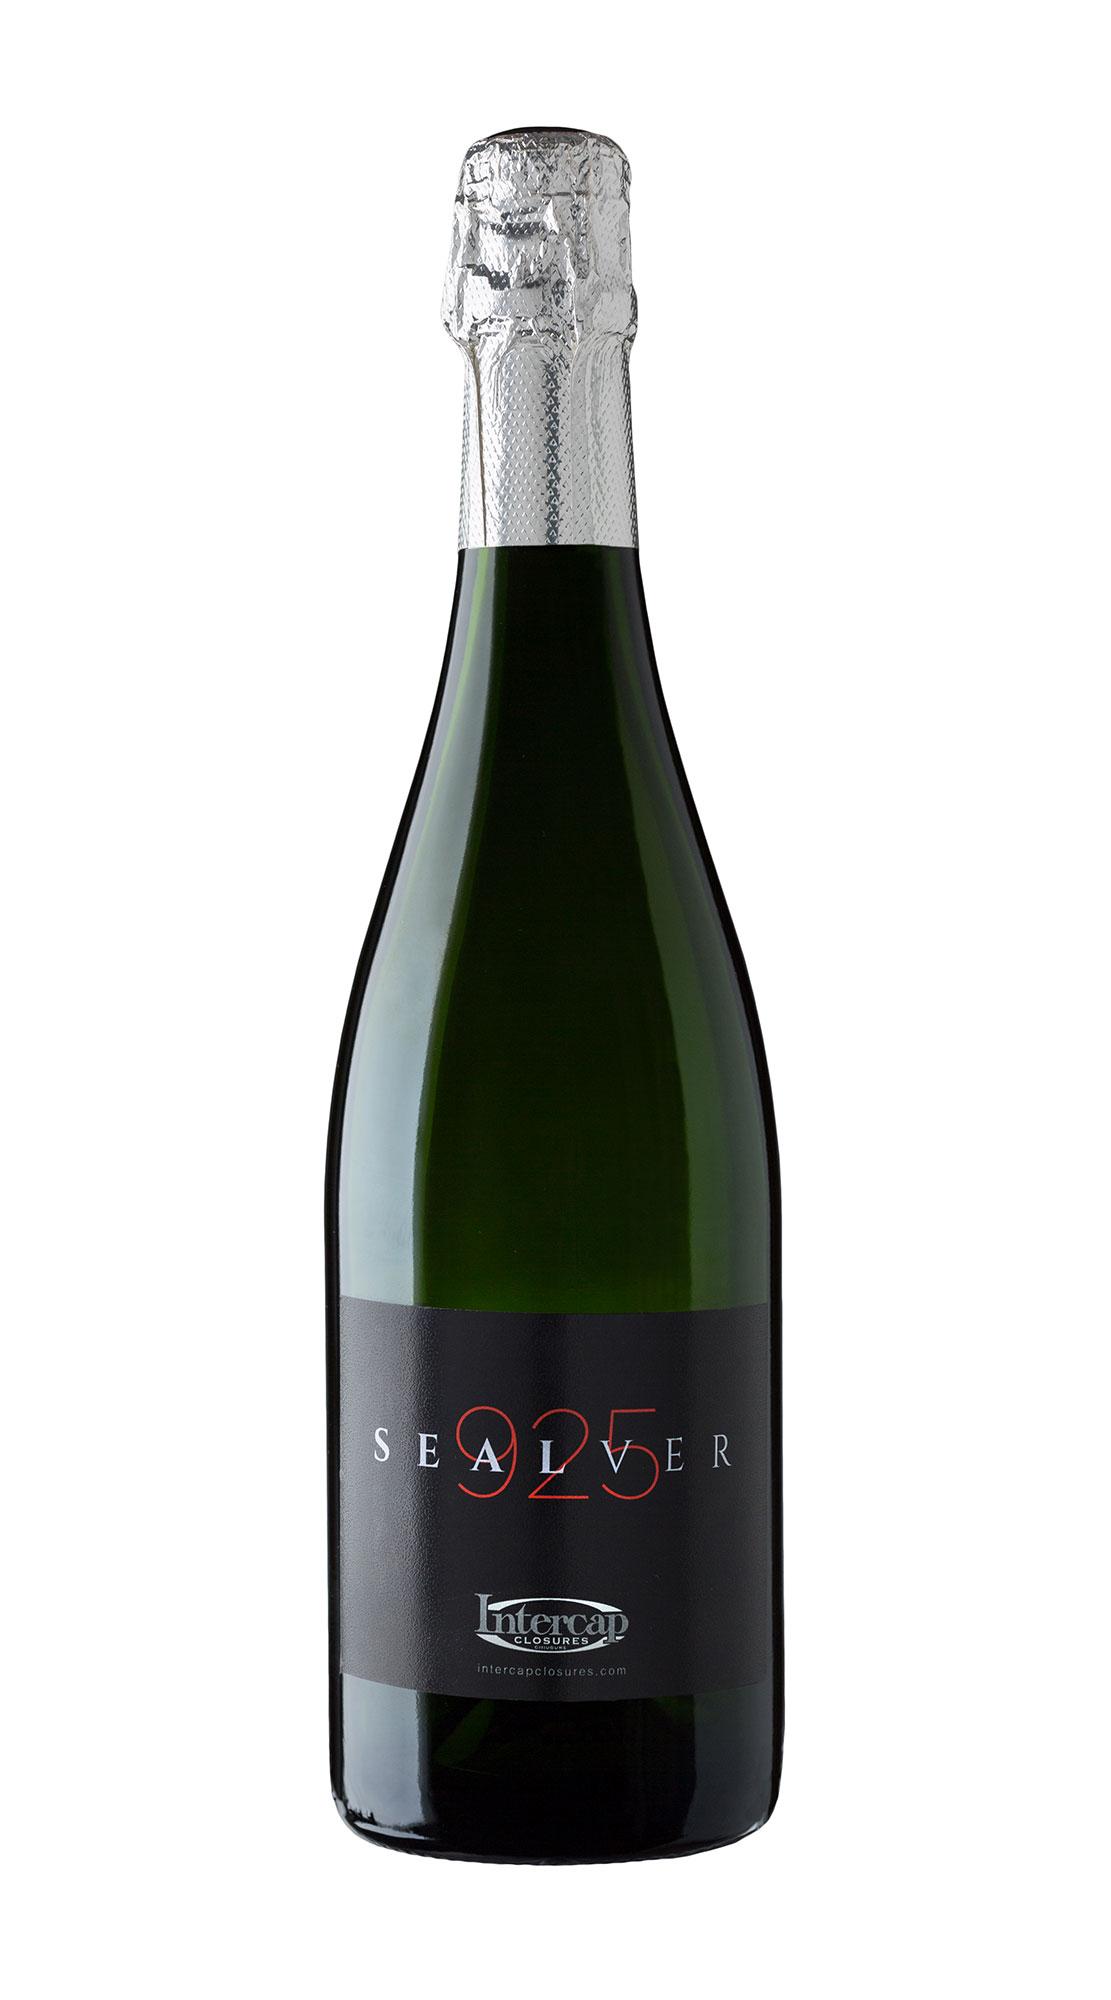 Silver closures 925 Sealver - $i